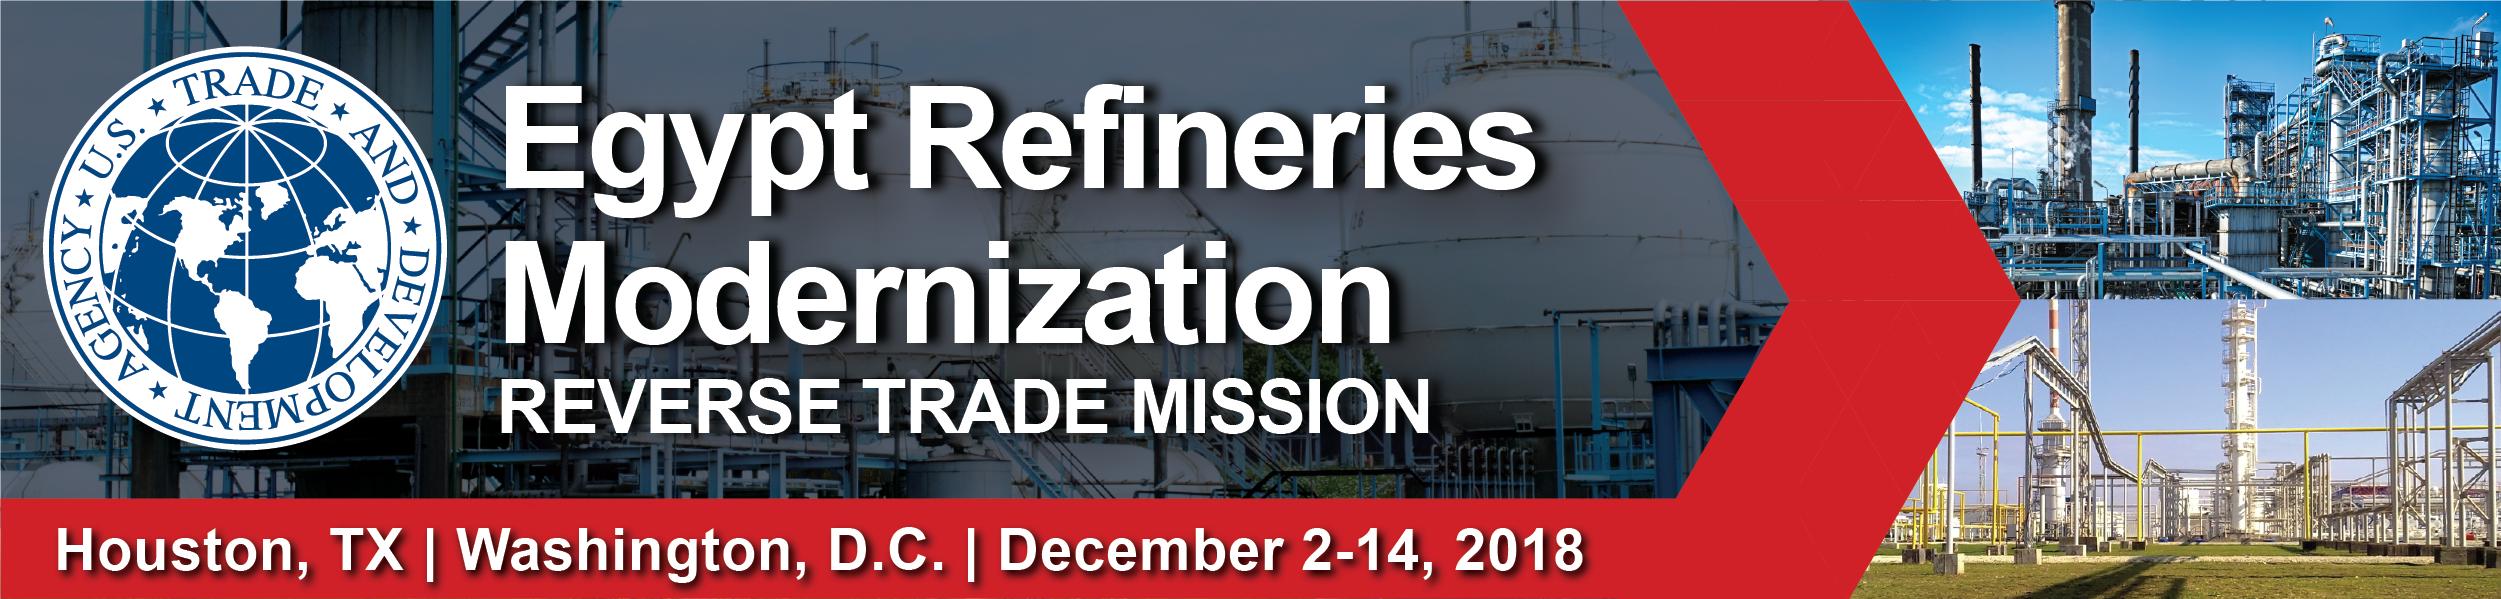 2018 Egypt Refineries Modernization RTM Dec.1 - Dec. 14 Header-05